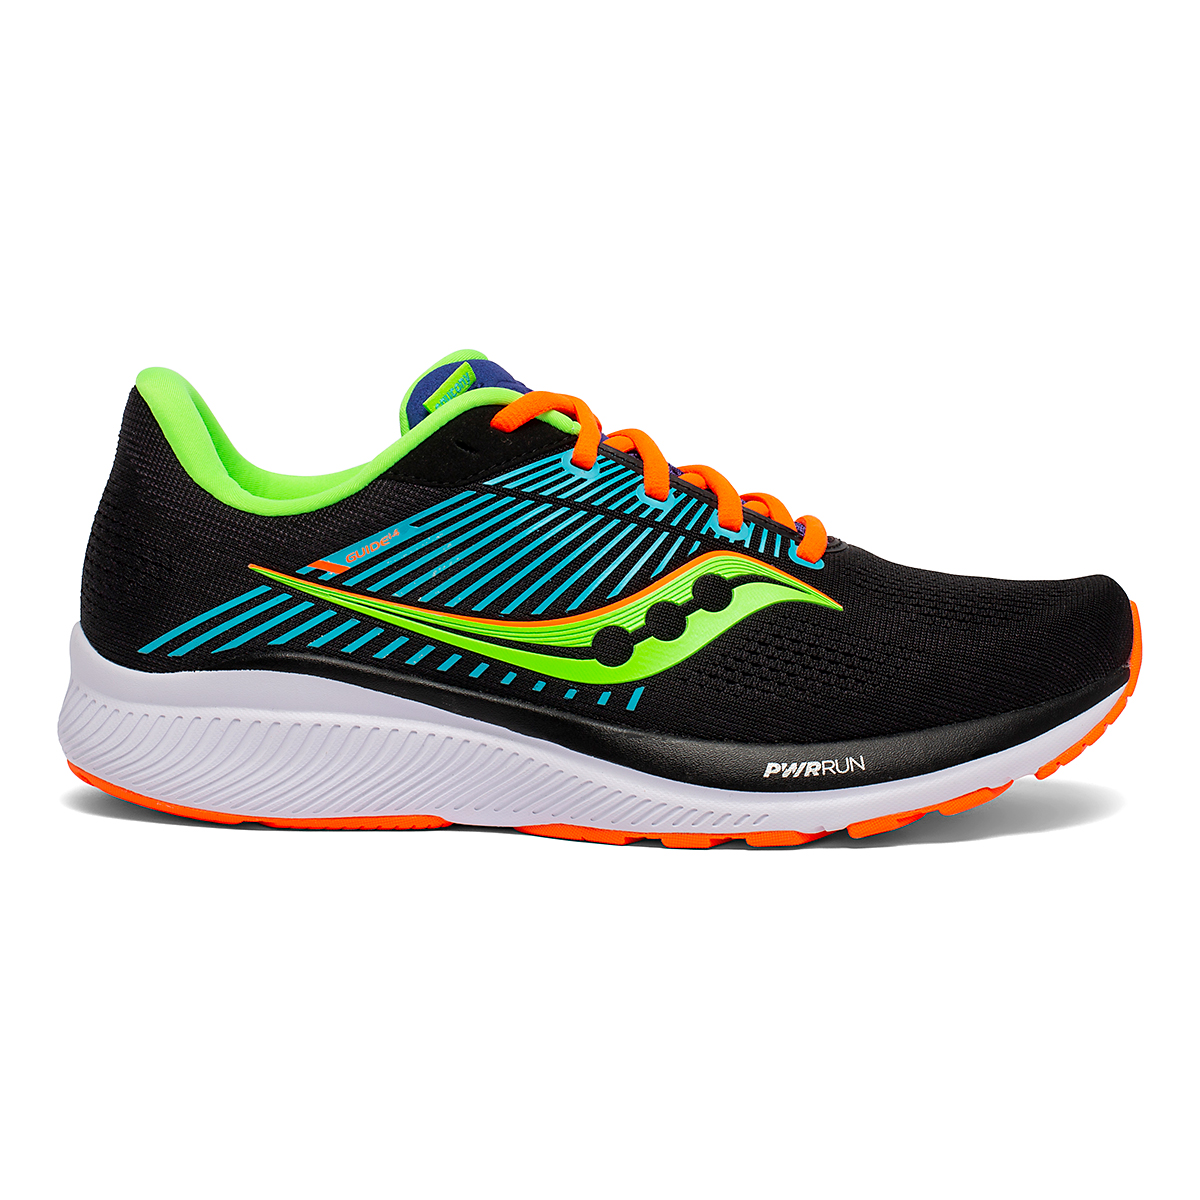 Men's Saucony Guide 14 Running Shoe - Color: Future/Black - Size: 7 - Width: Regular, Future/Black, large, image 1